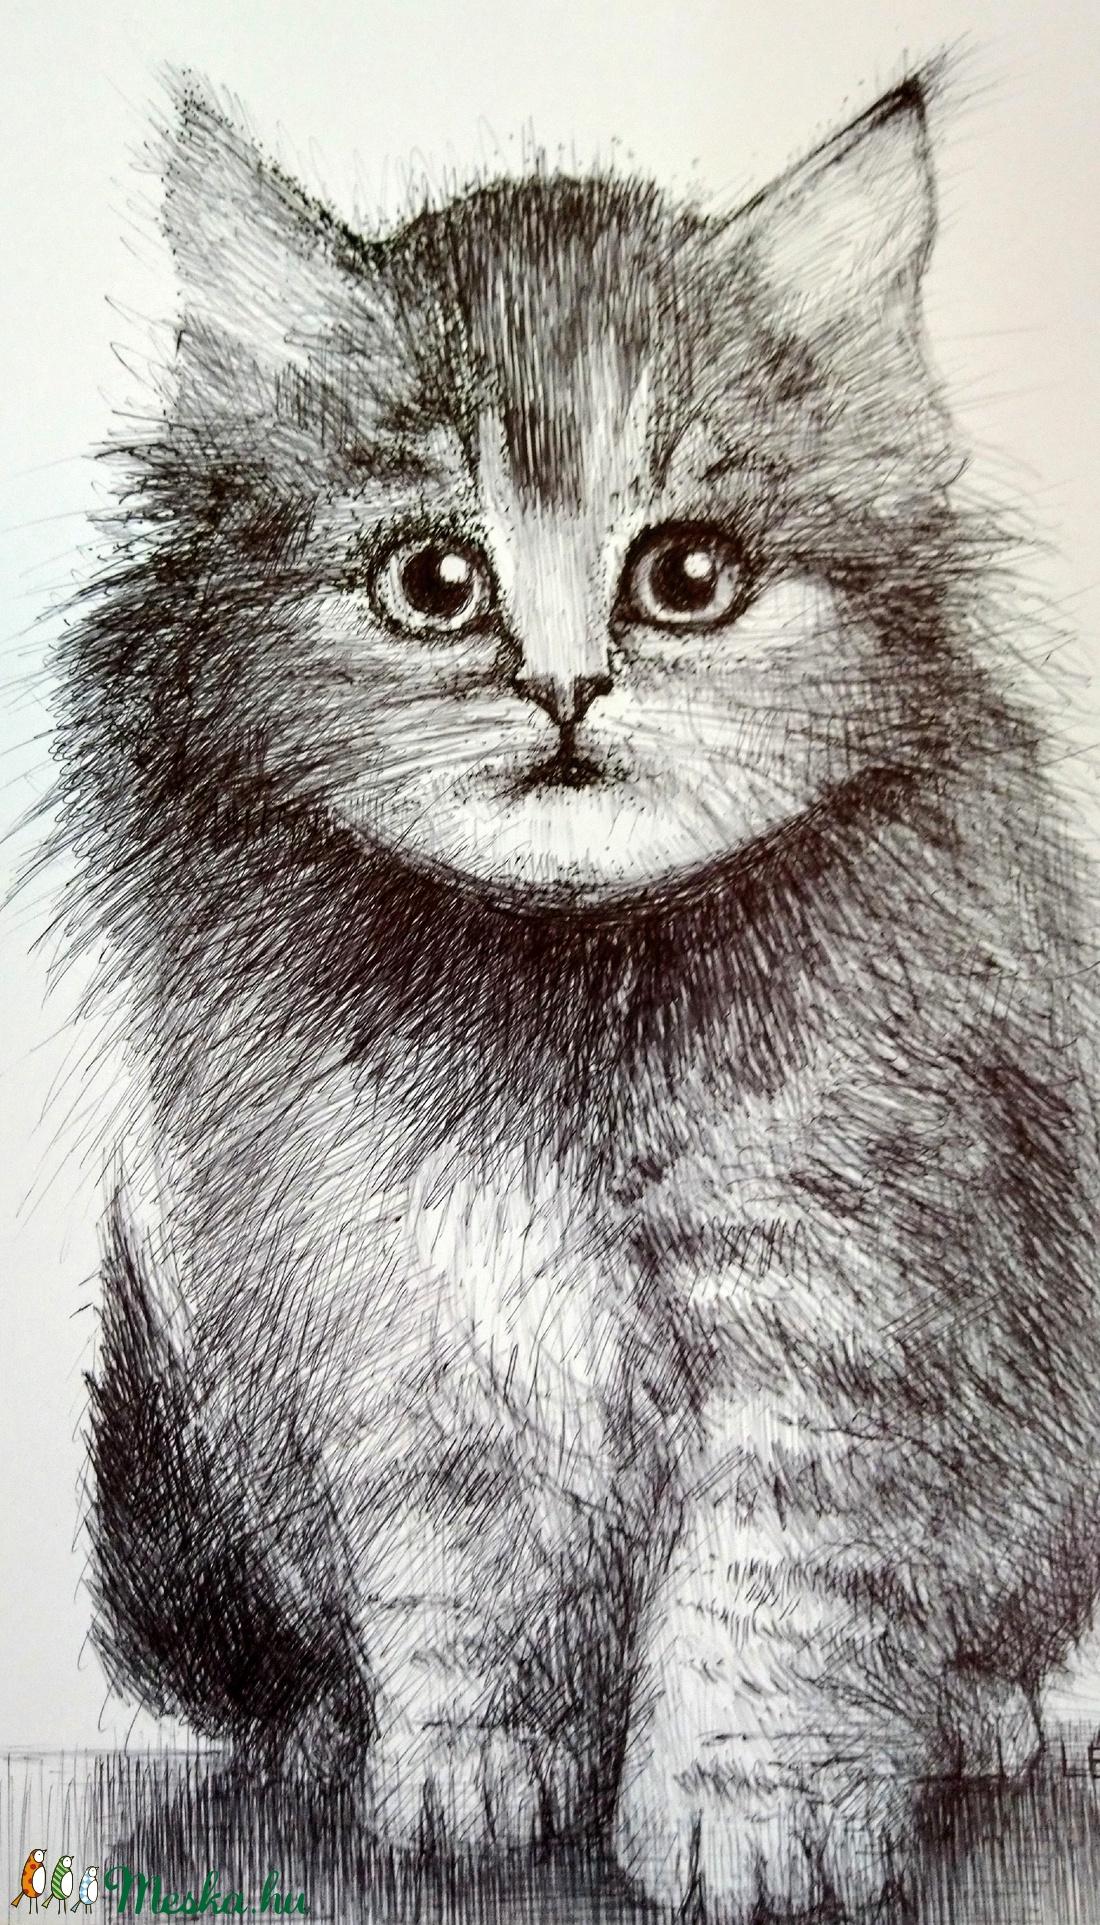 Cicamica - művészet - grafika & illusztráció - Meska.hu